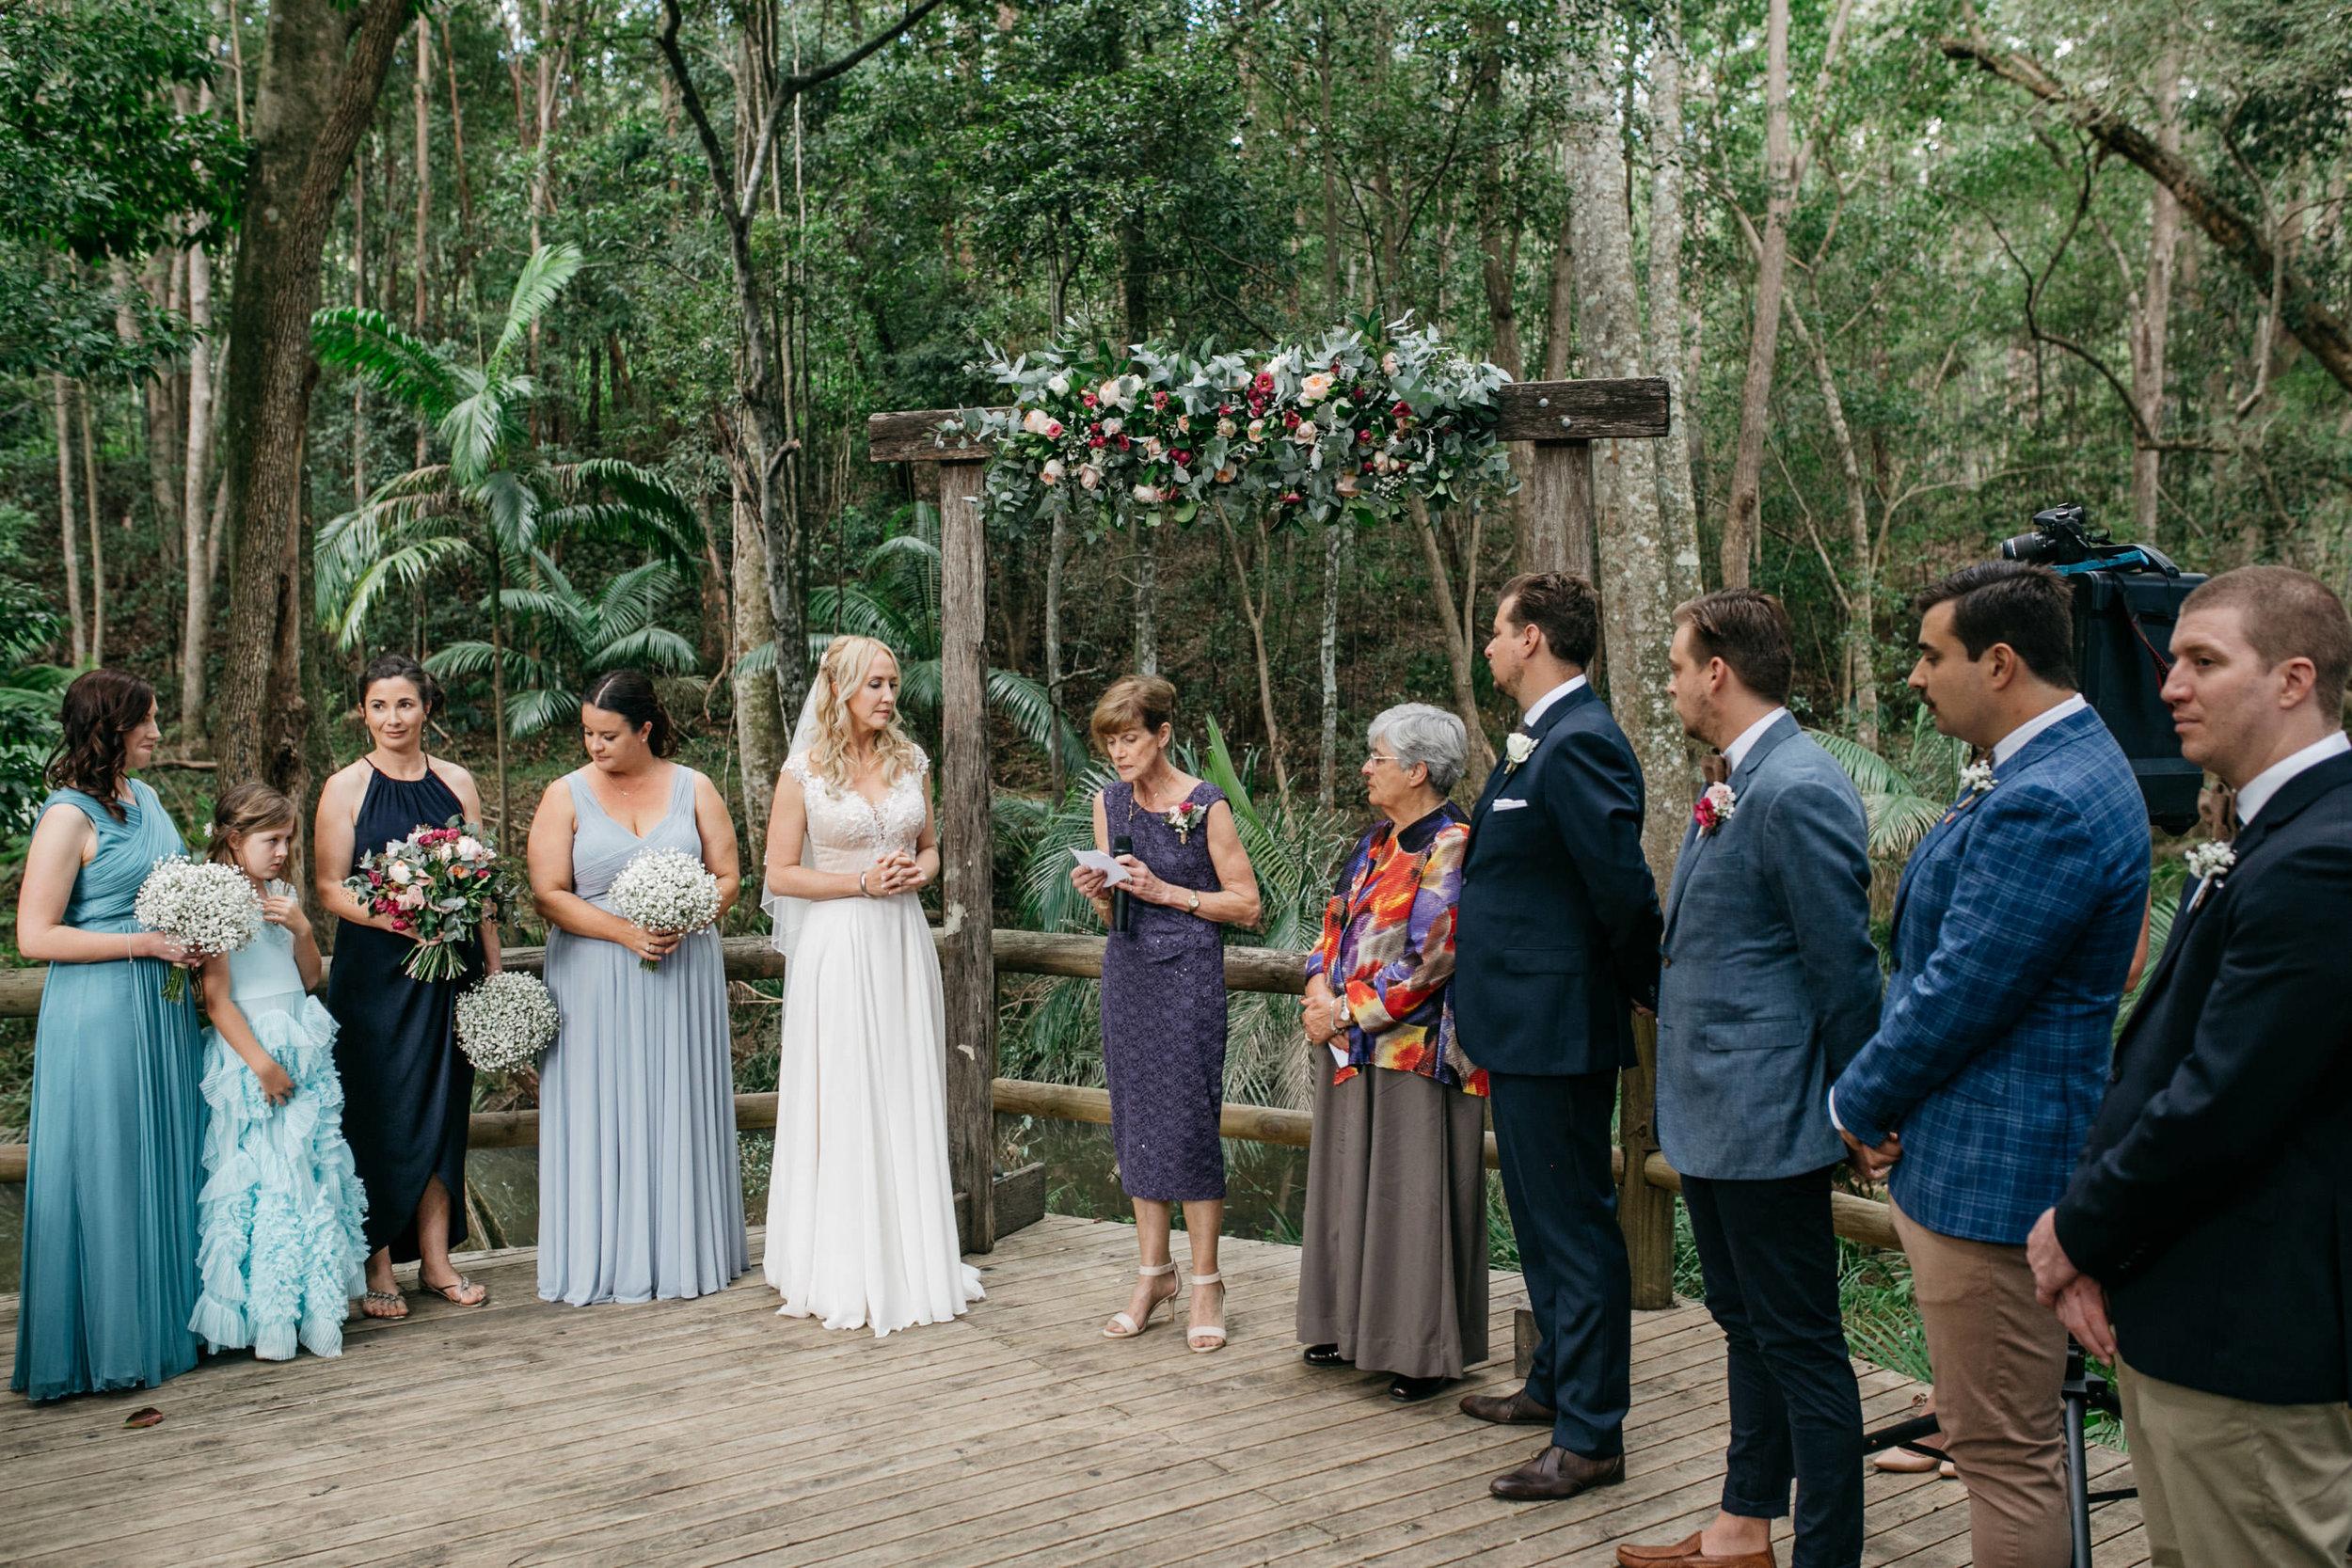 True North Photography_Boomerang Farm_Stacey and Isaac_Gold Coast Wedding_Barm Wedding_Hinterland Wedding-93.jpg